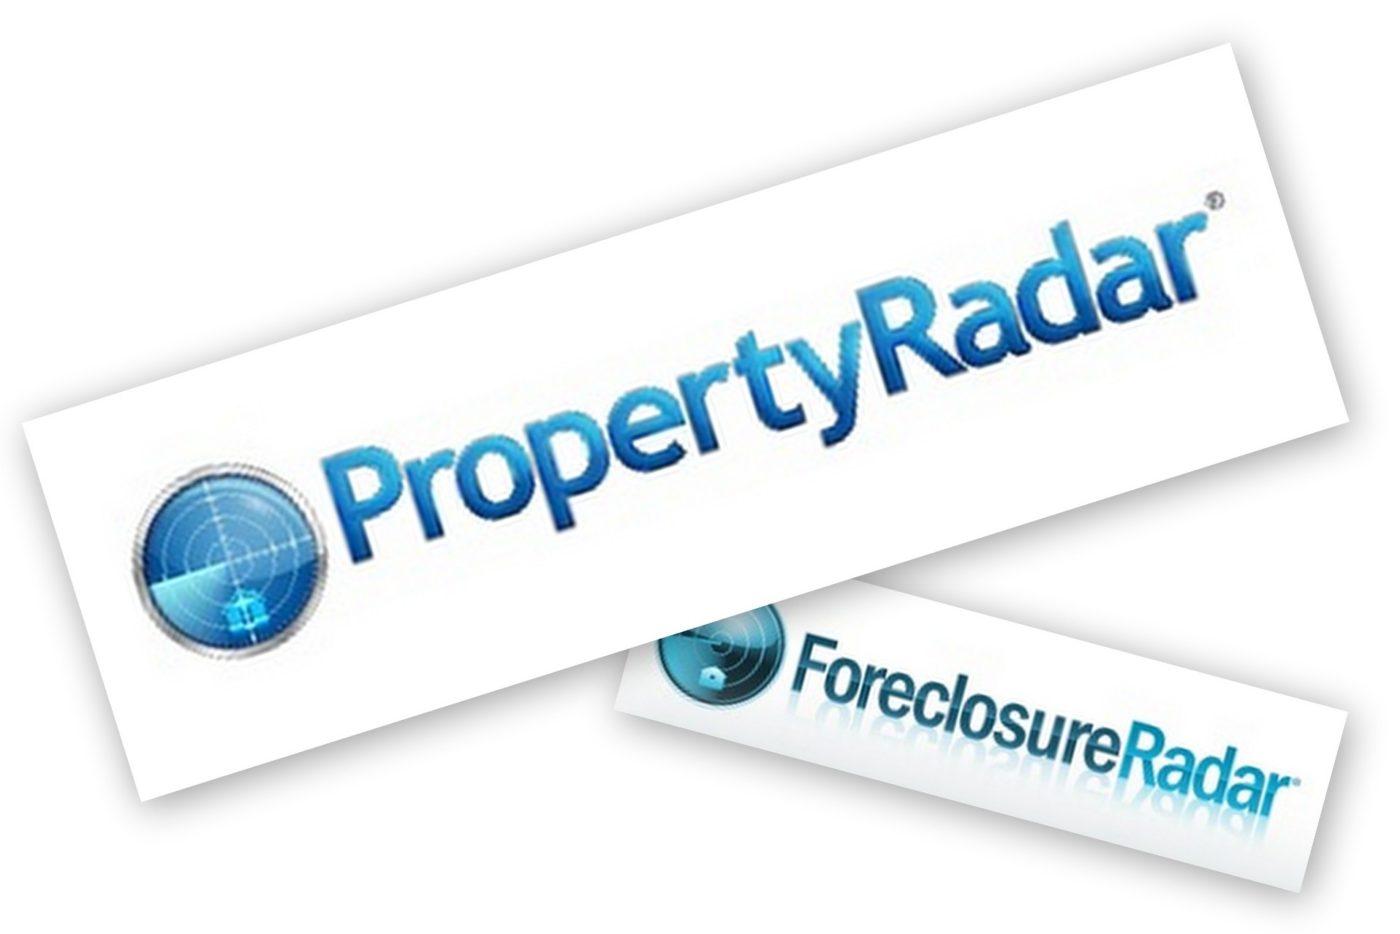 ForeclosureRadar rebrands as PropertyRadar